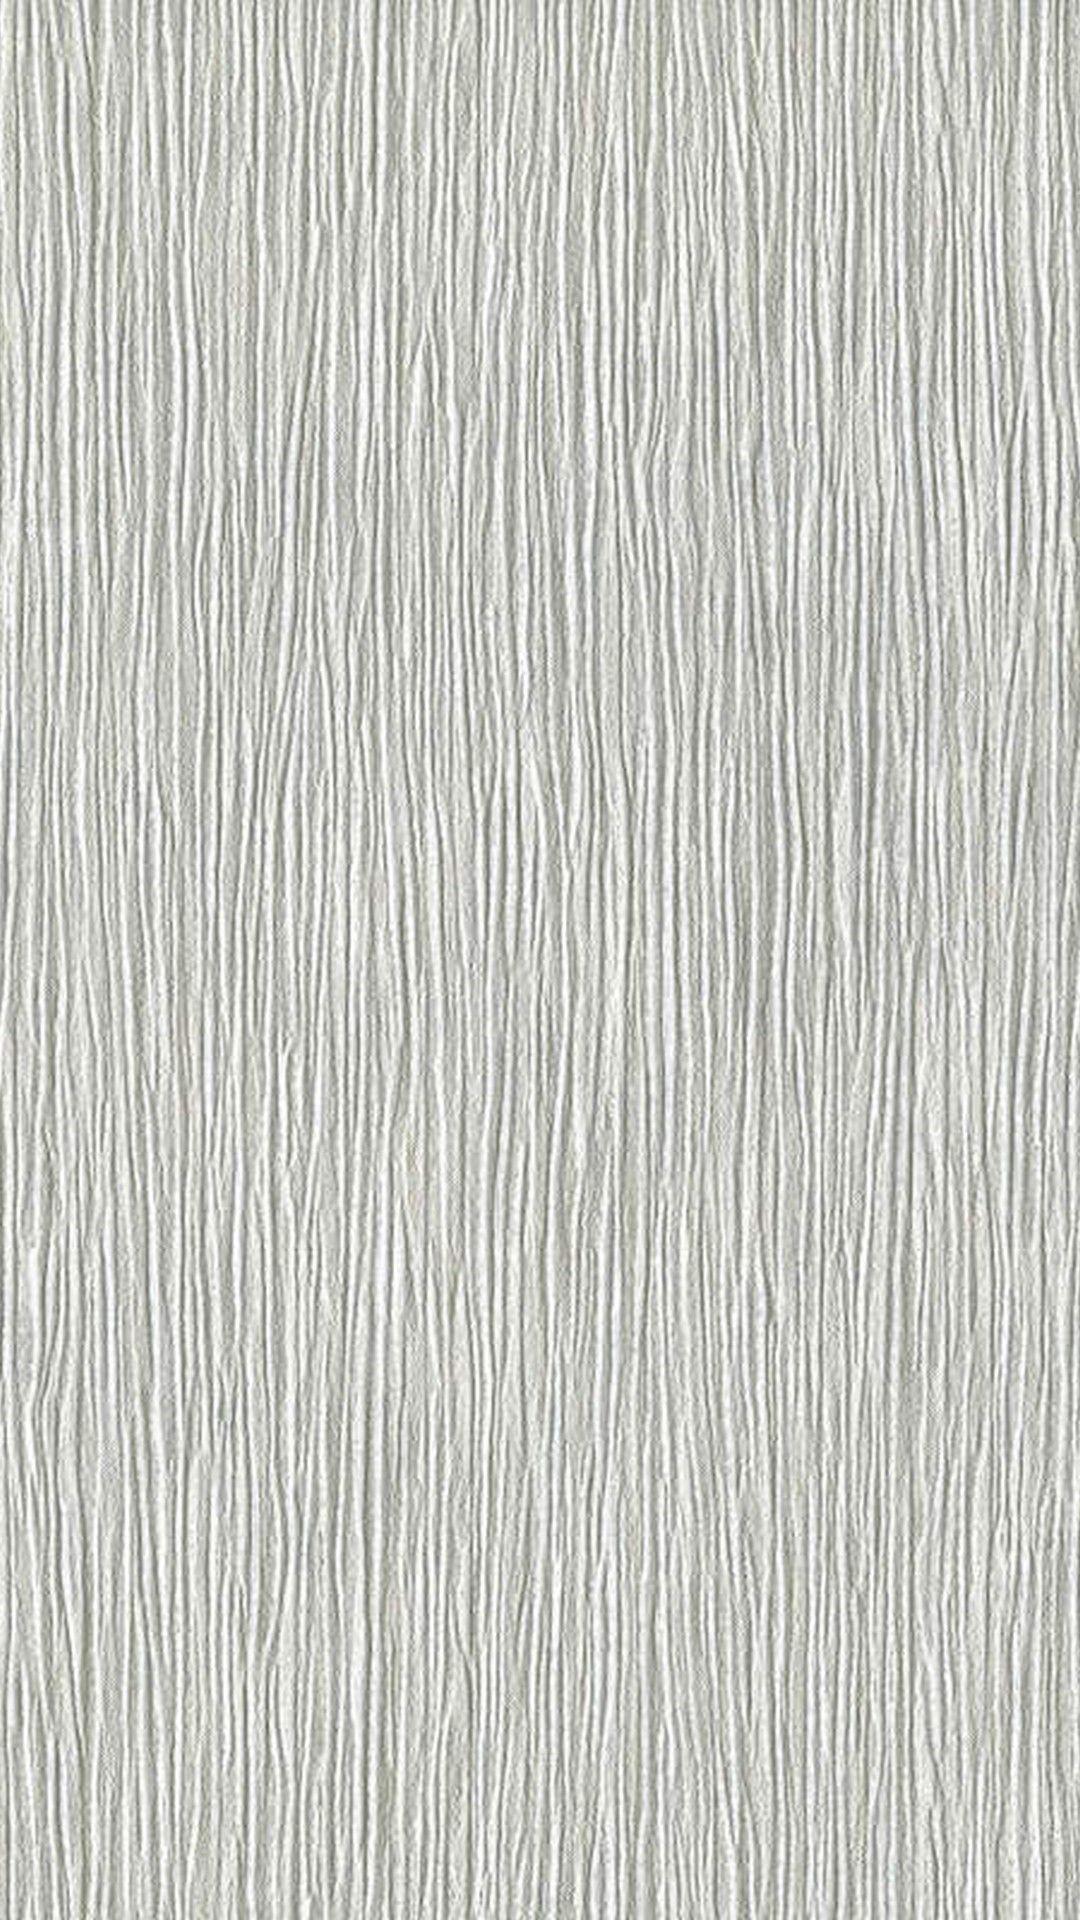 iPhone X Wallpaper Silver - Best iPhone Wallpaper